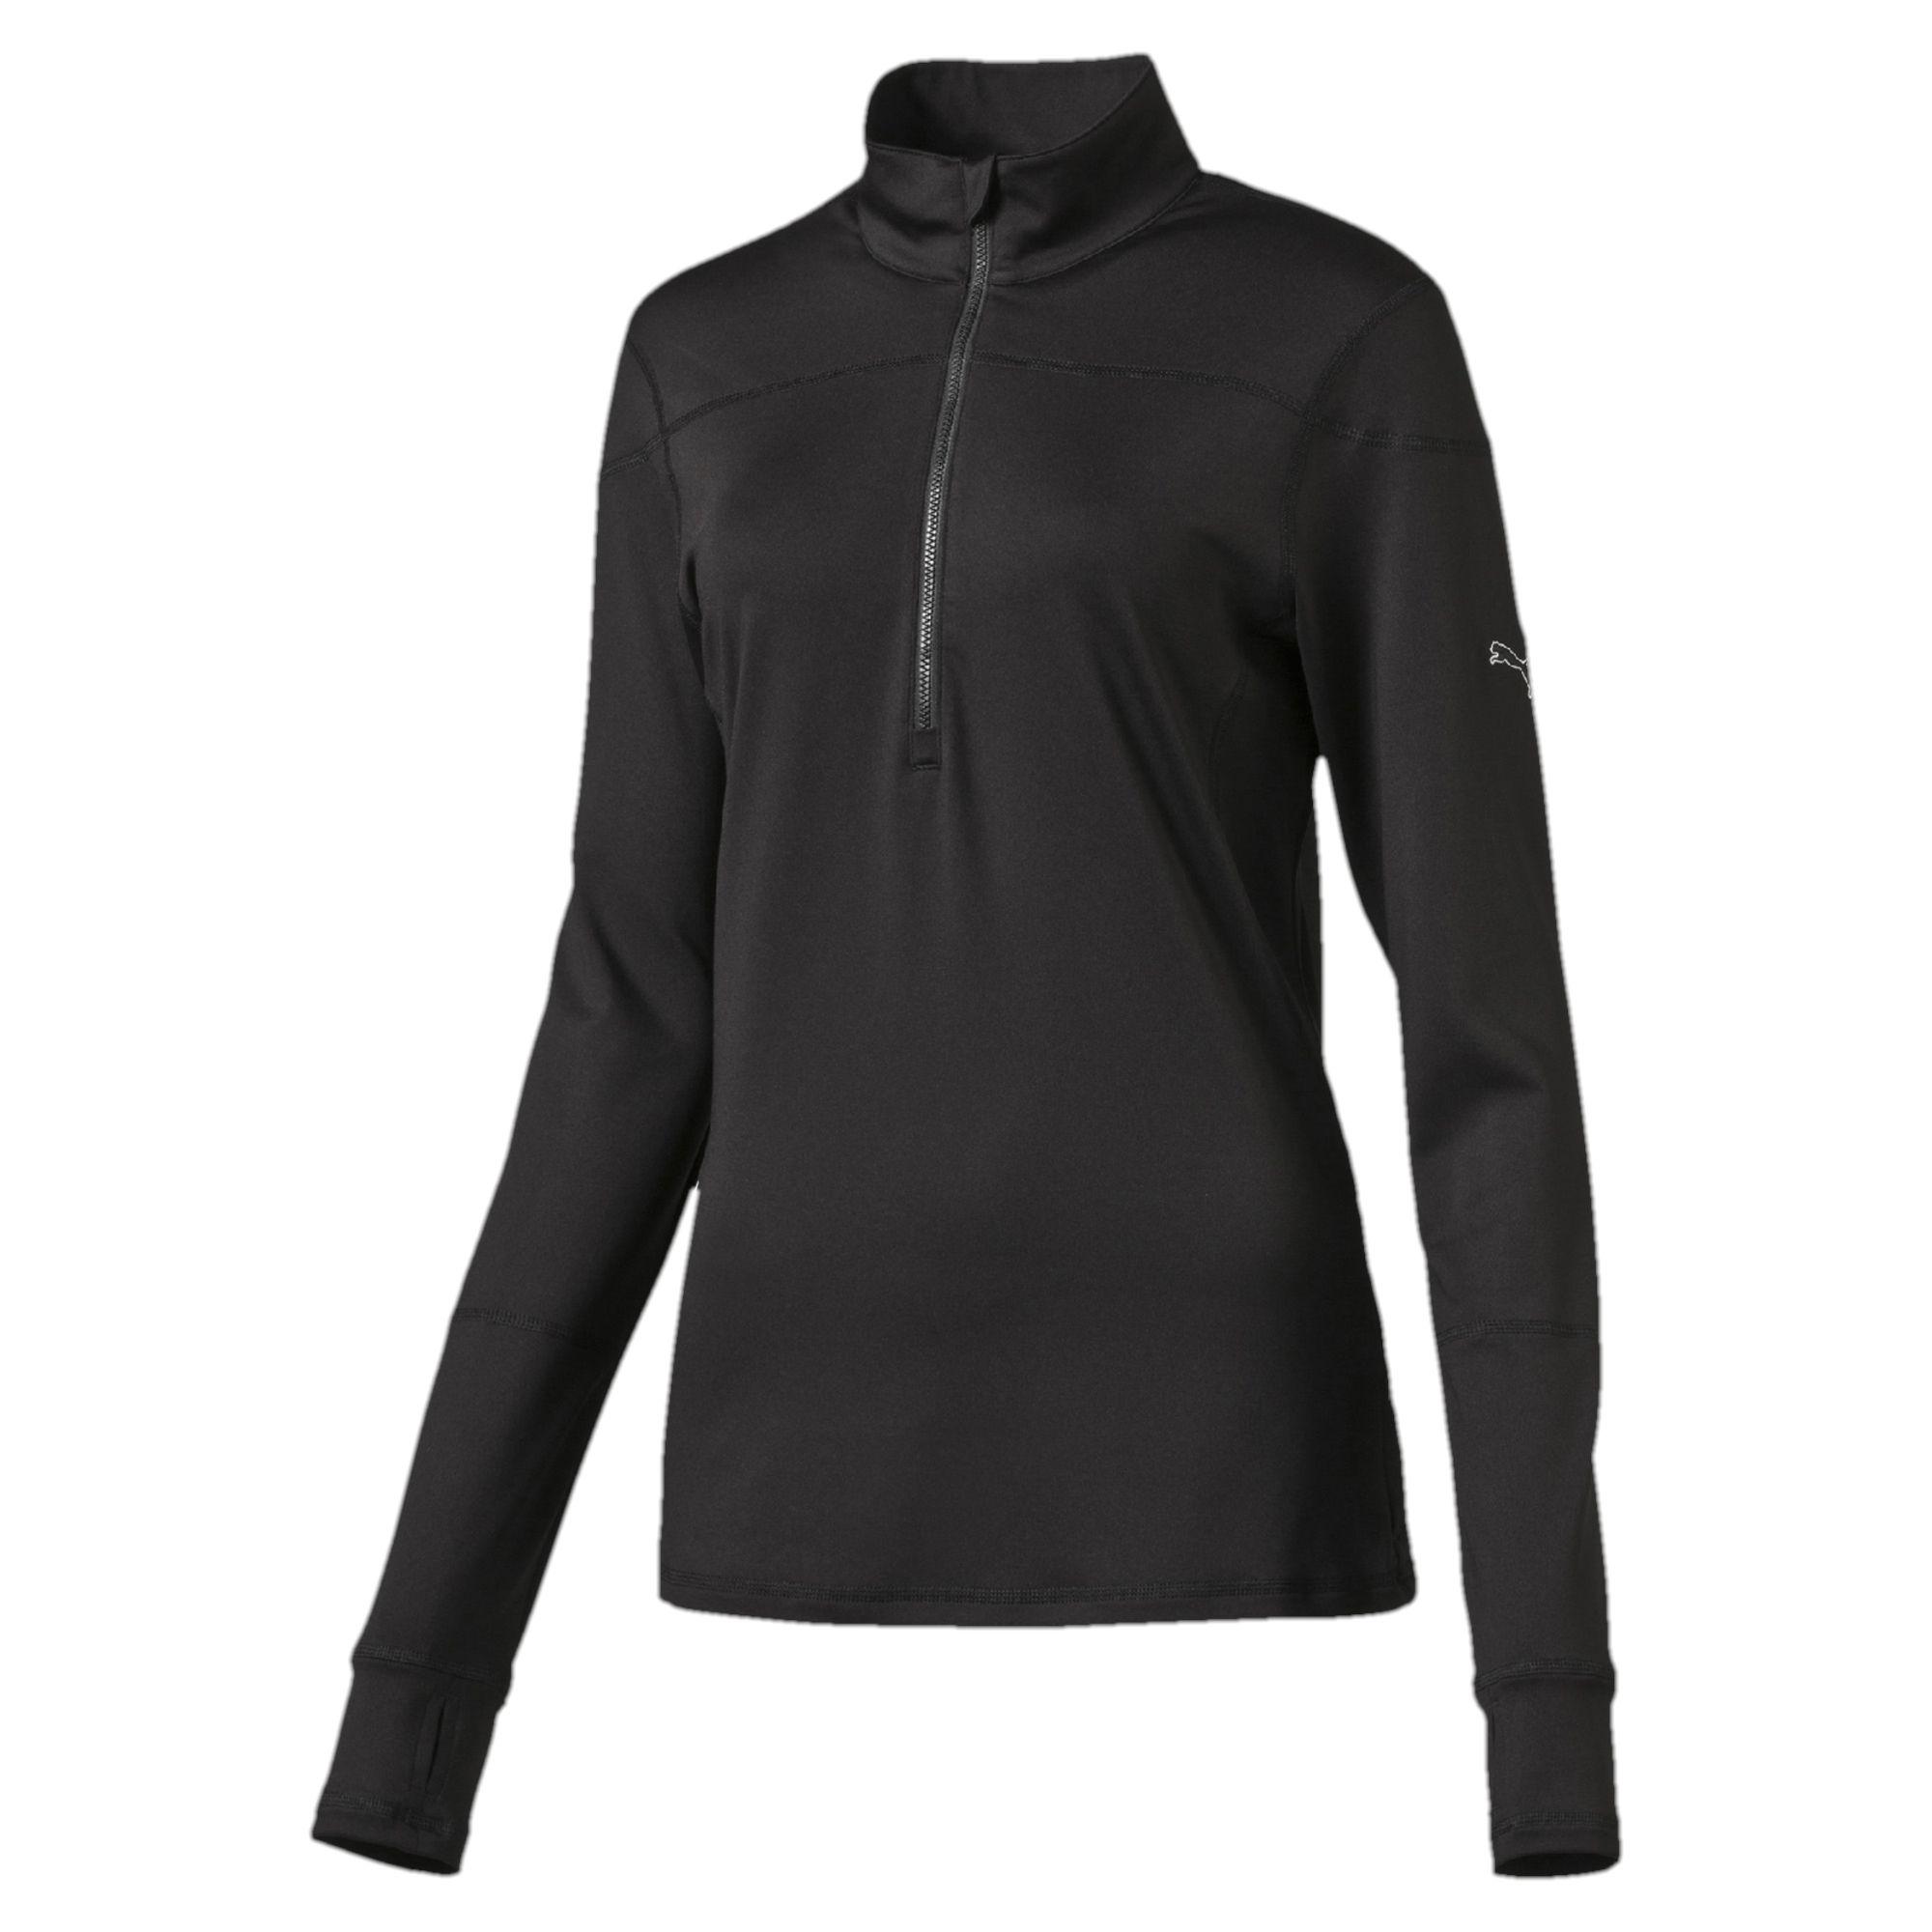 puma golf damen sweatshirt golf pullover frauen neu ebay. Black Bedroom Furniture Sets. Home Design Ideas